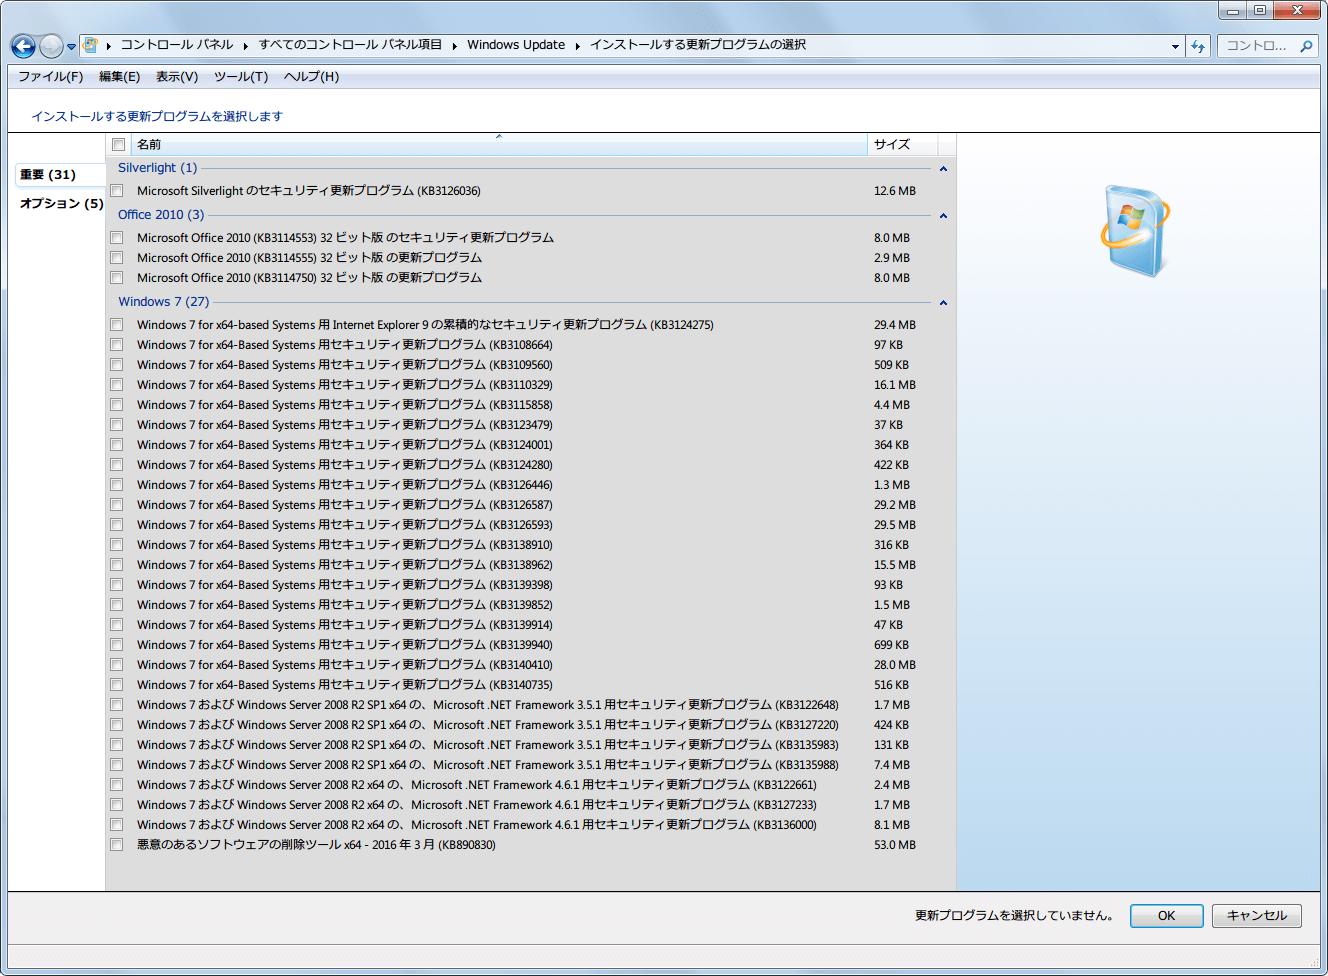 Windows 7 64bit Windows Update 重要 2016年1月~3月分リスト Windows 10 アップグレード関連プログラム除外済み(KB2952664、KB3035583、KB3118401、KB3121255、KB3123862、KB3135445、KB3138612)